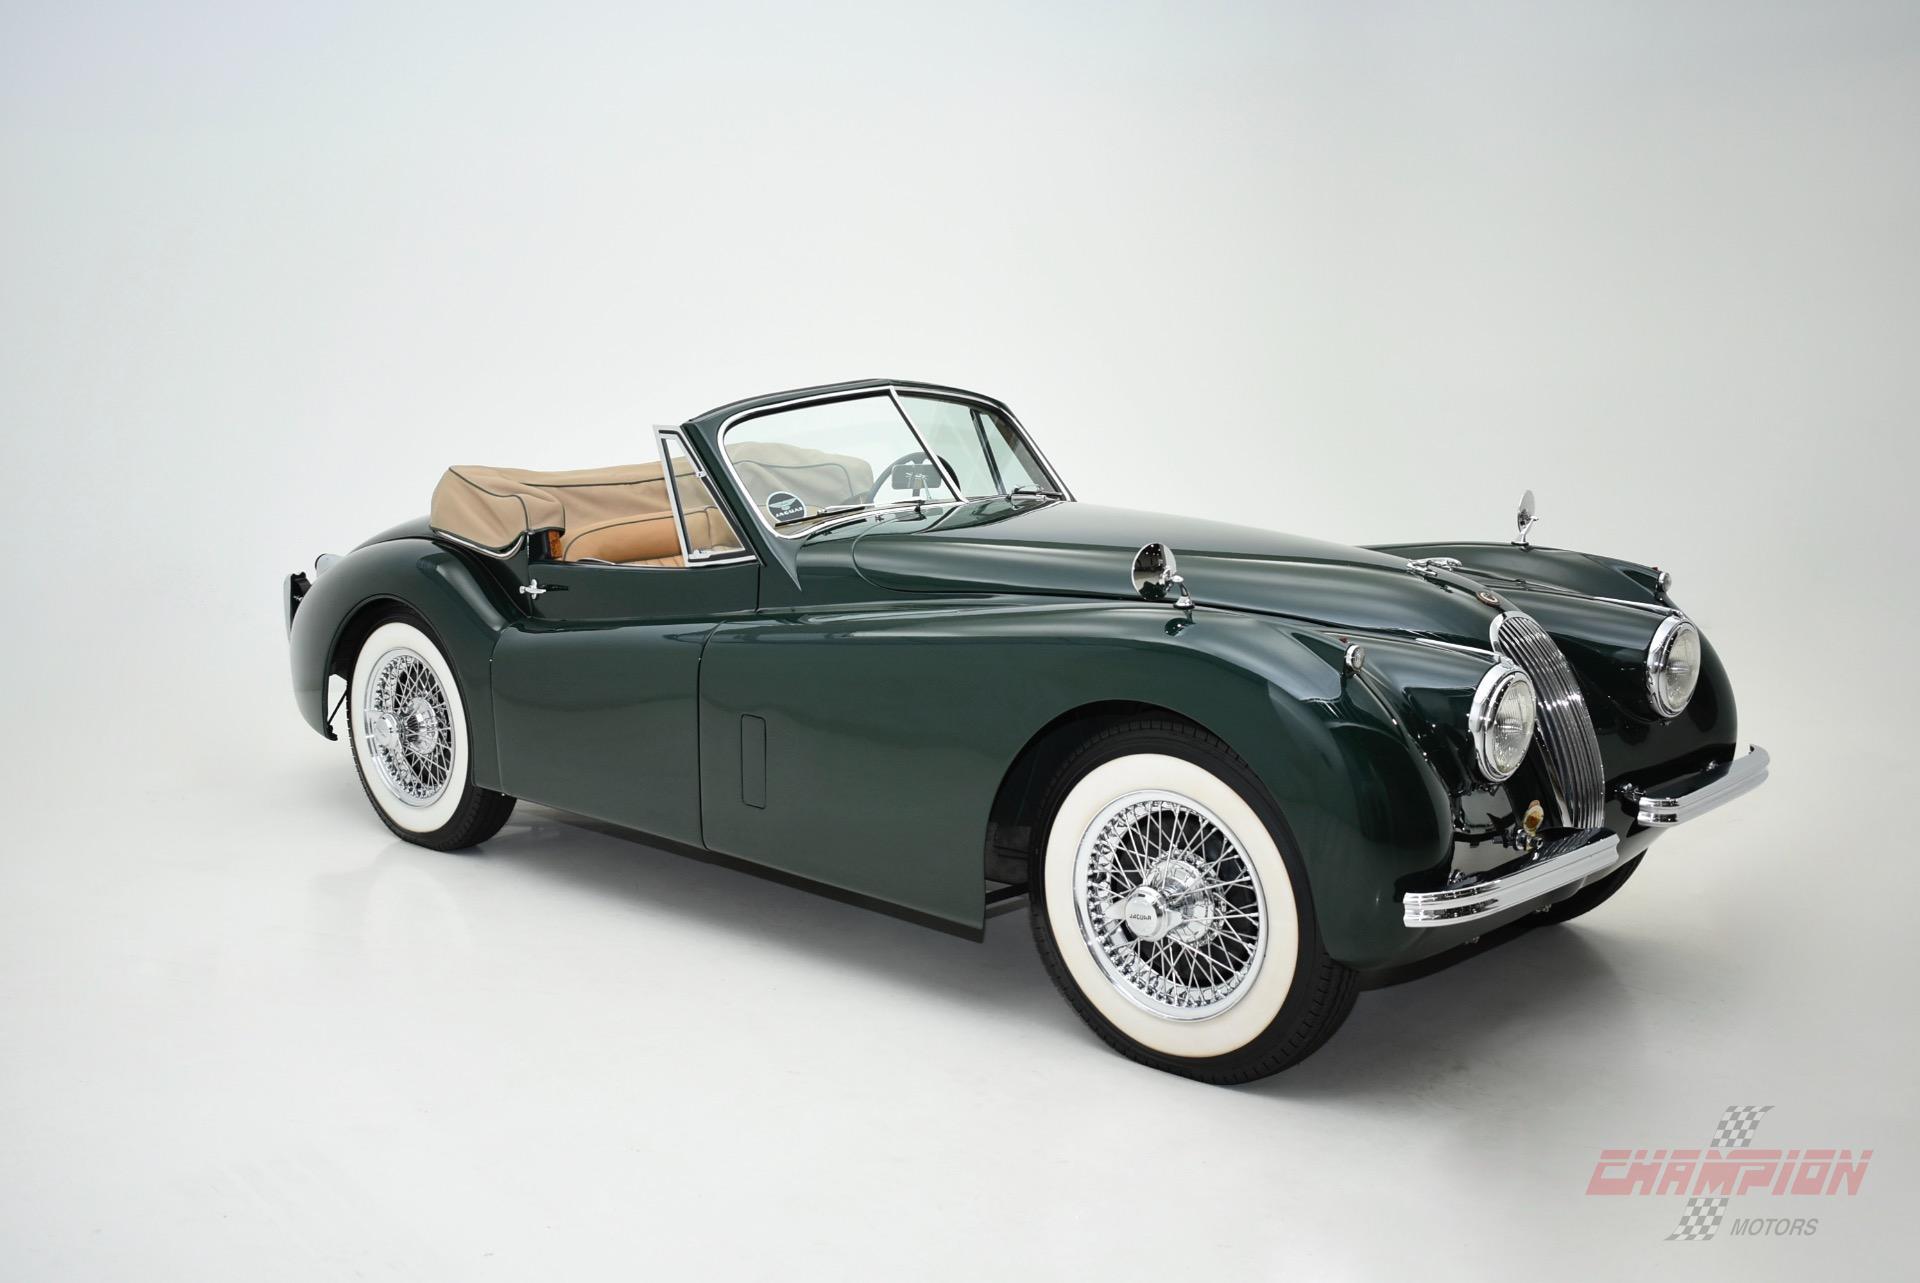 Exotic Car Dealership >> 1954 Jaguar XK120 Drophead Coupe - Champion Motors International l Exotic Classic Car Dealership ...